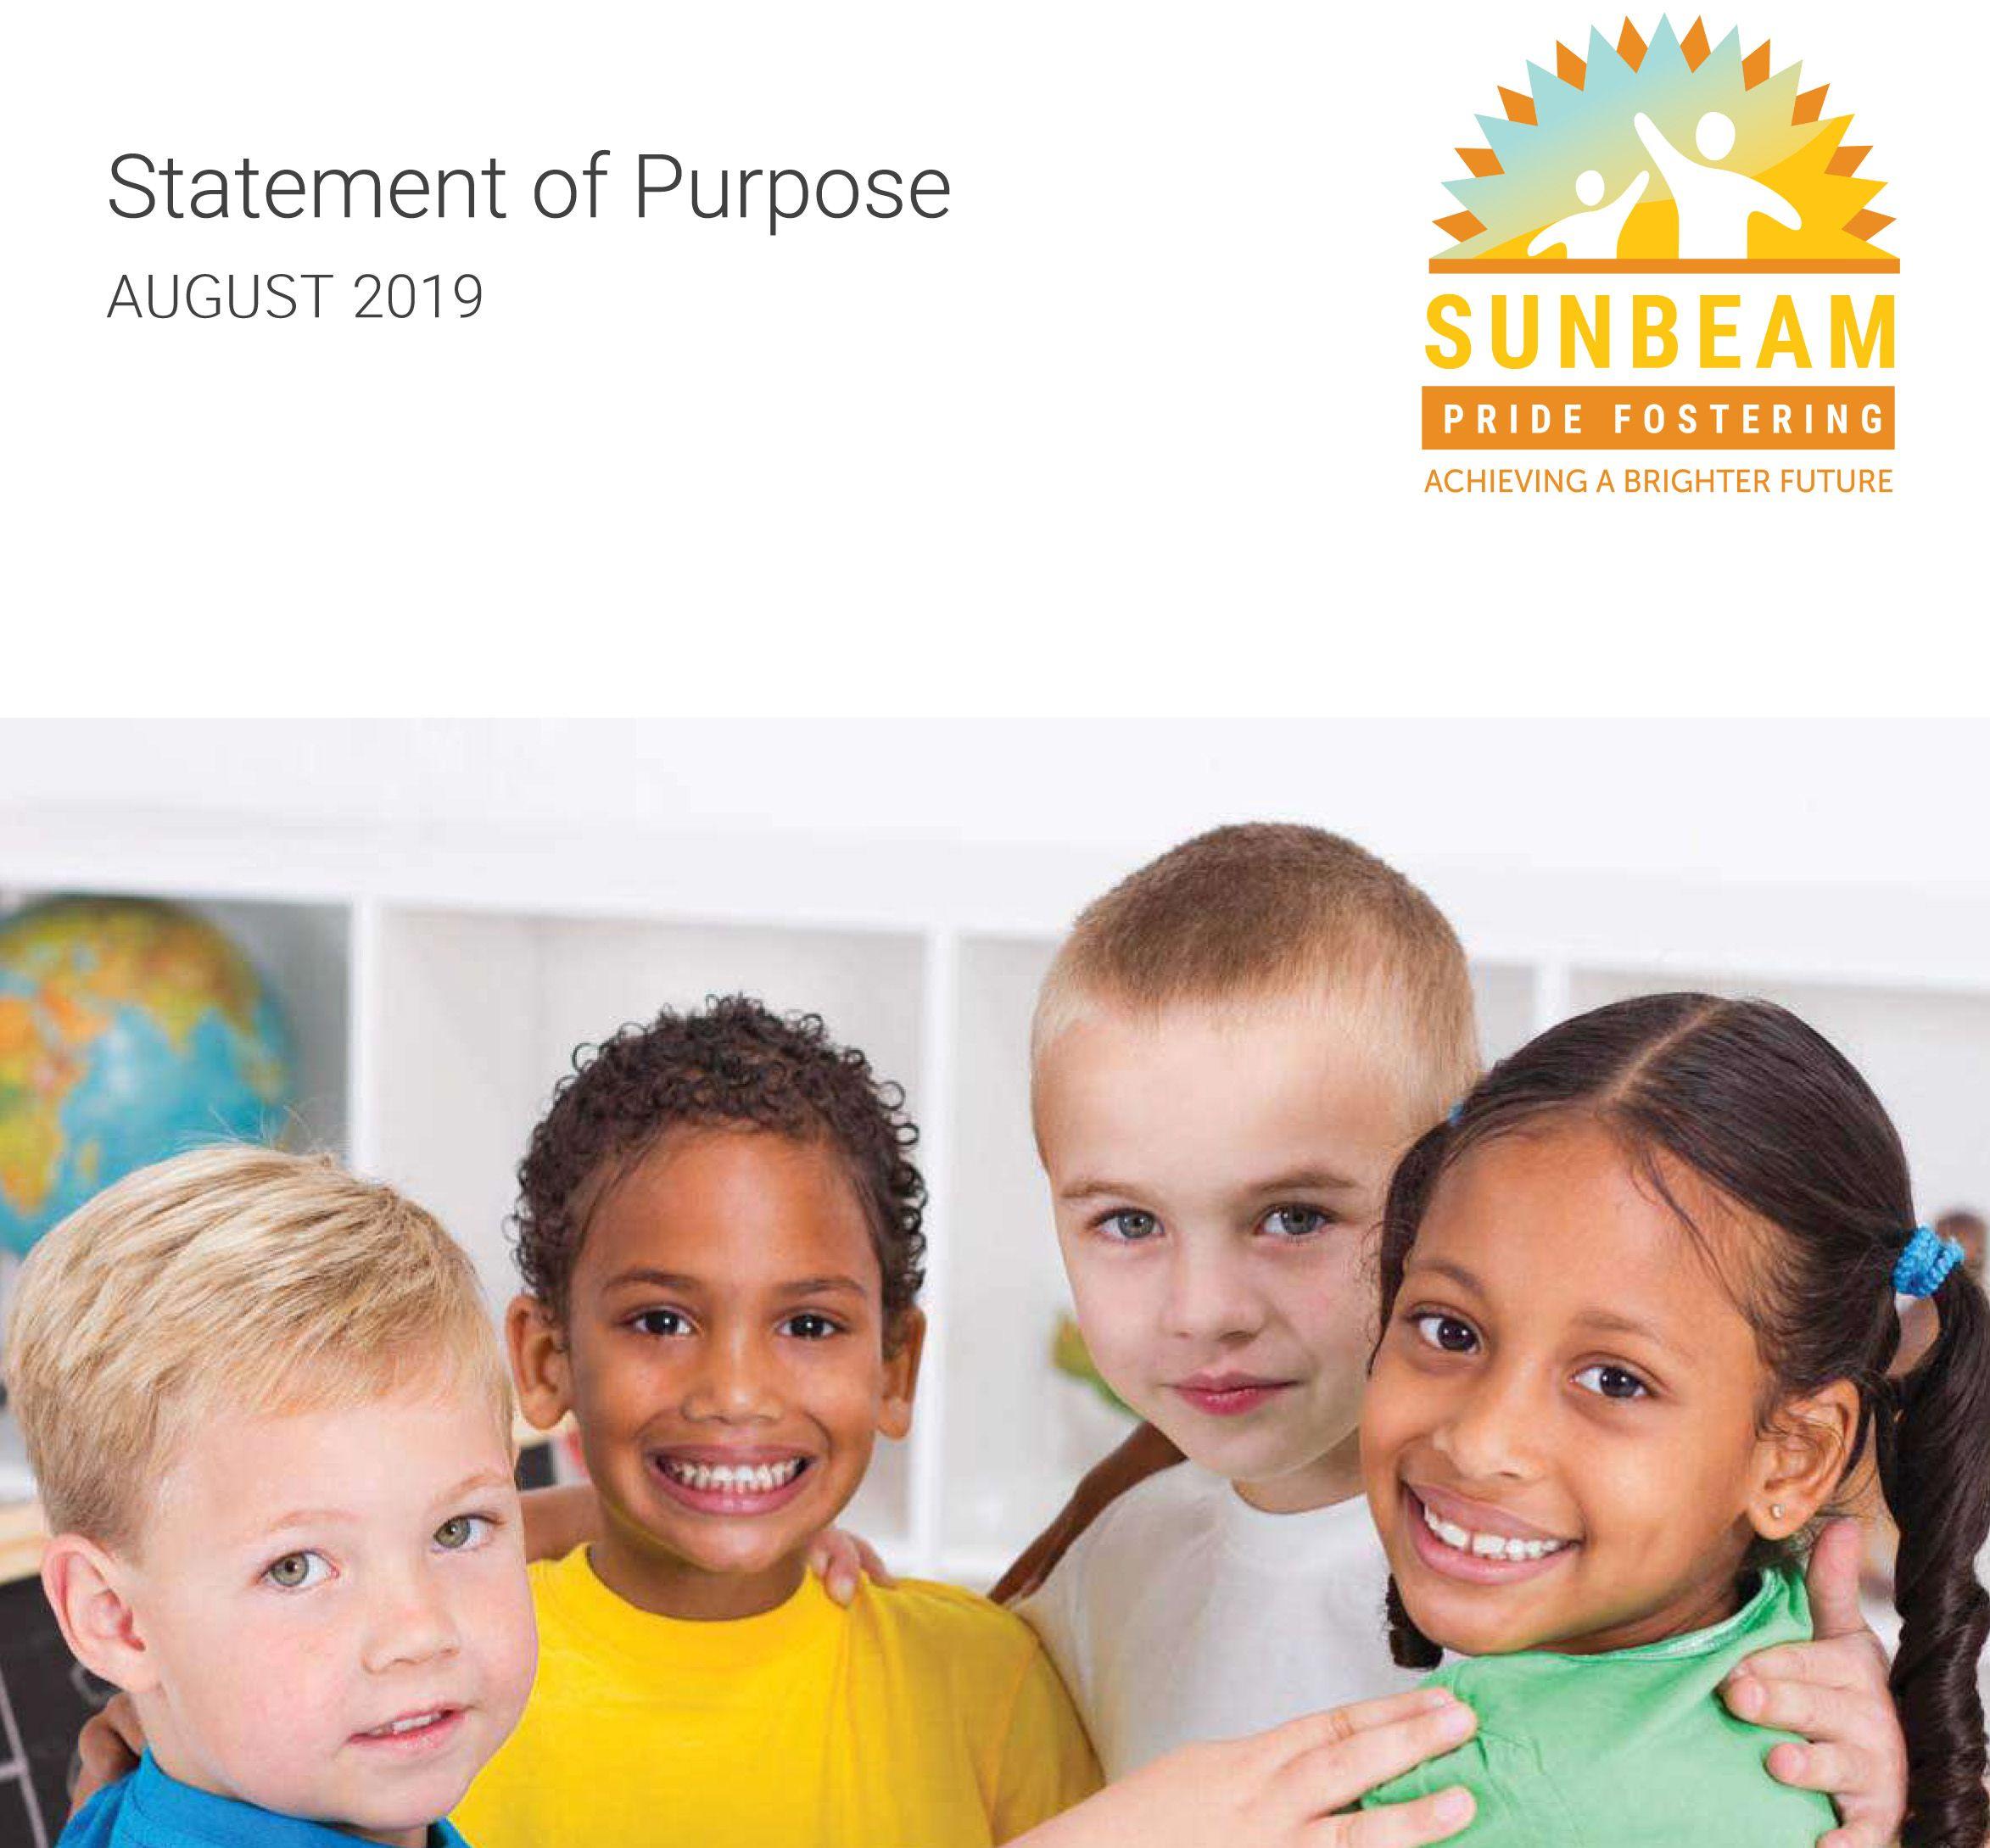 Statement of Purpose Pride